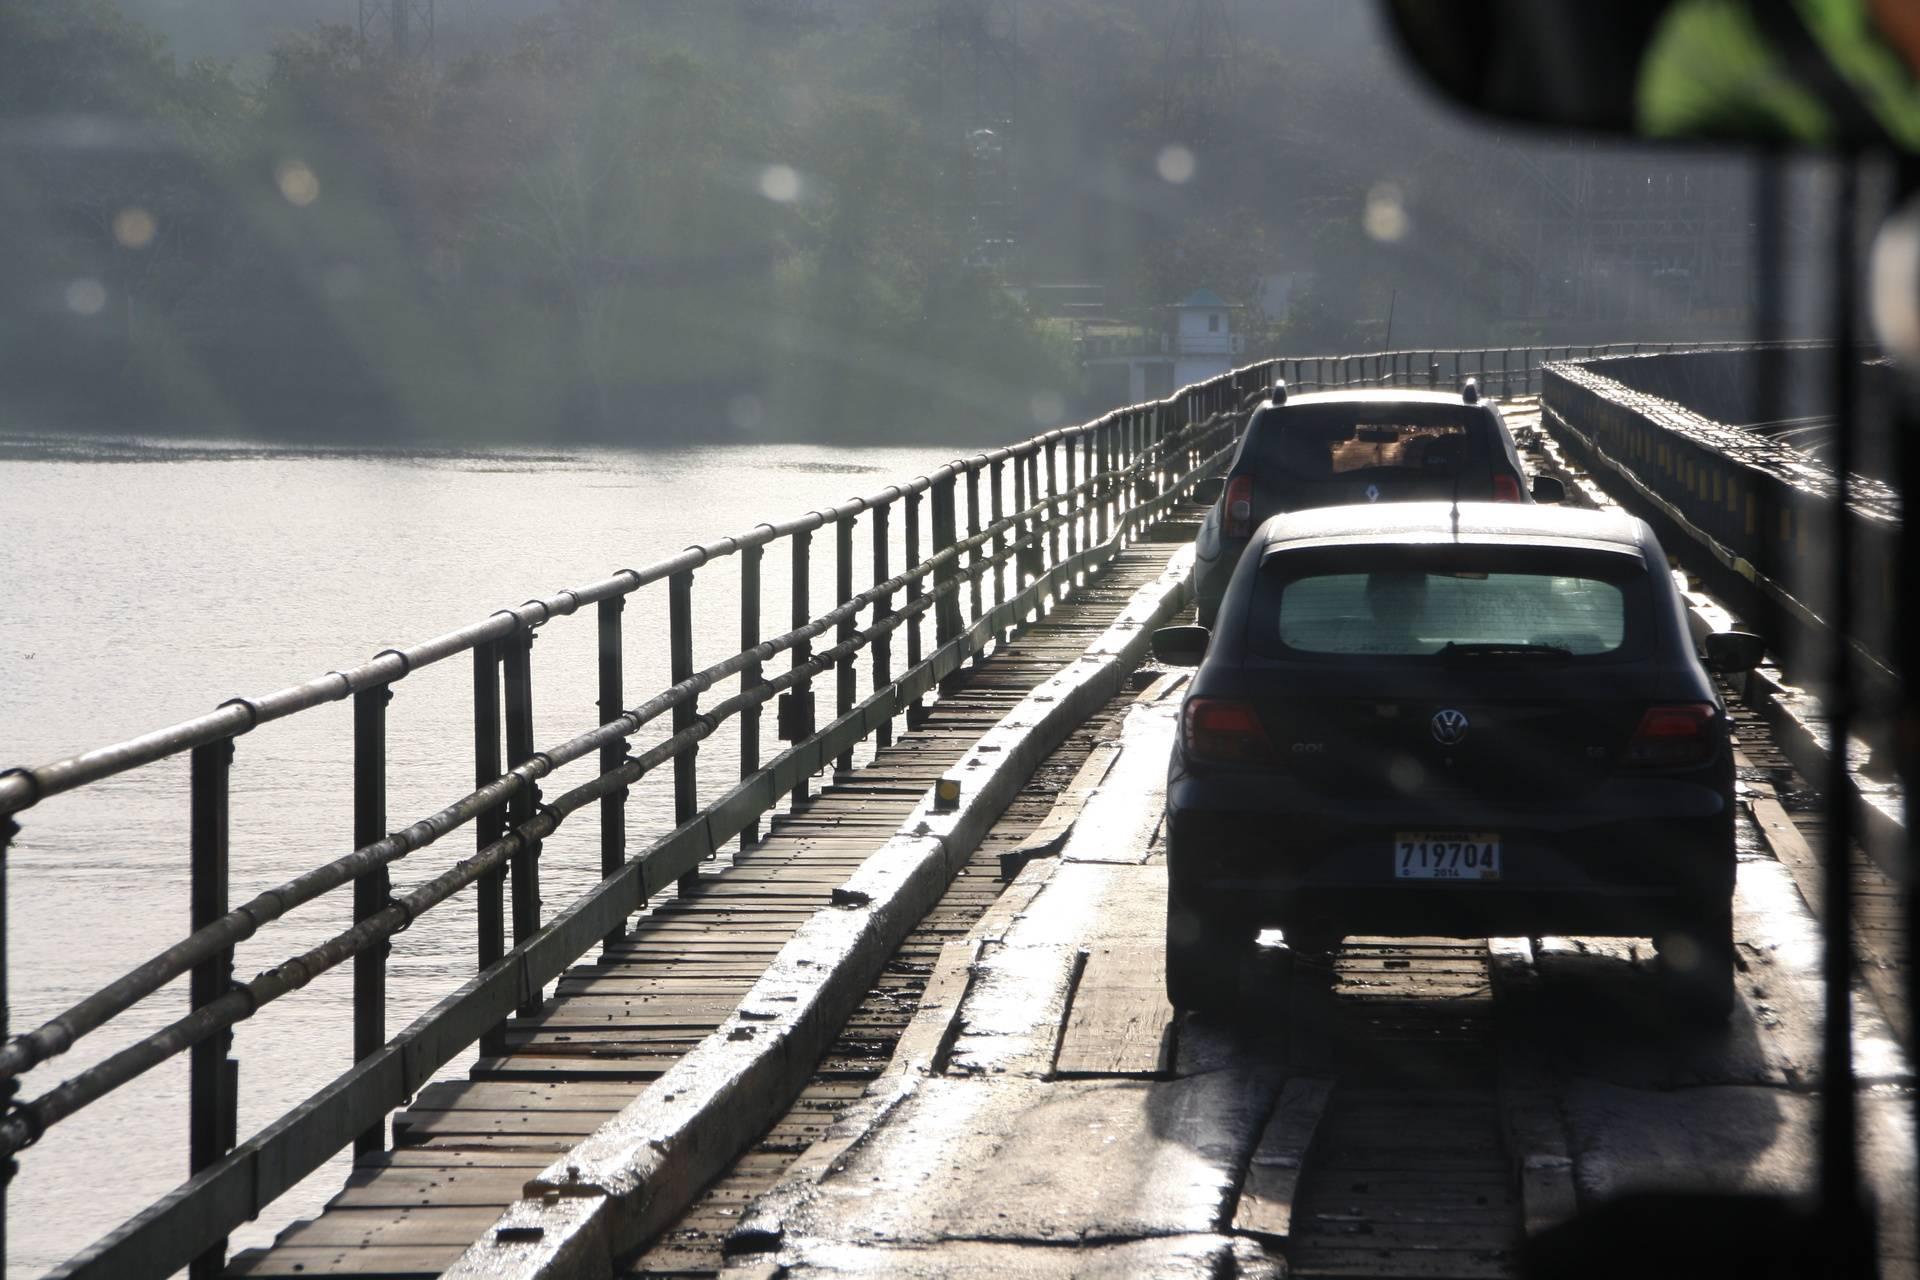 Bridge over Changres River at Gamboa